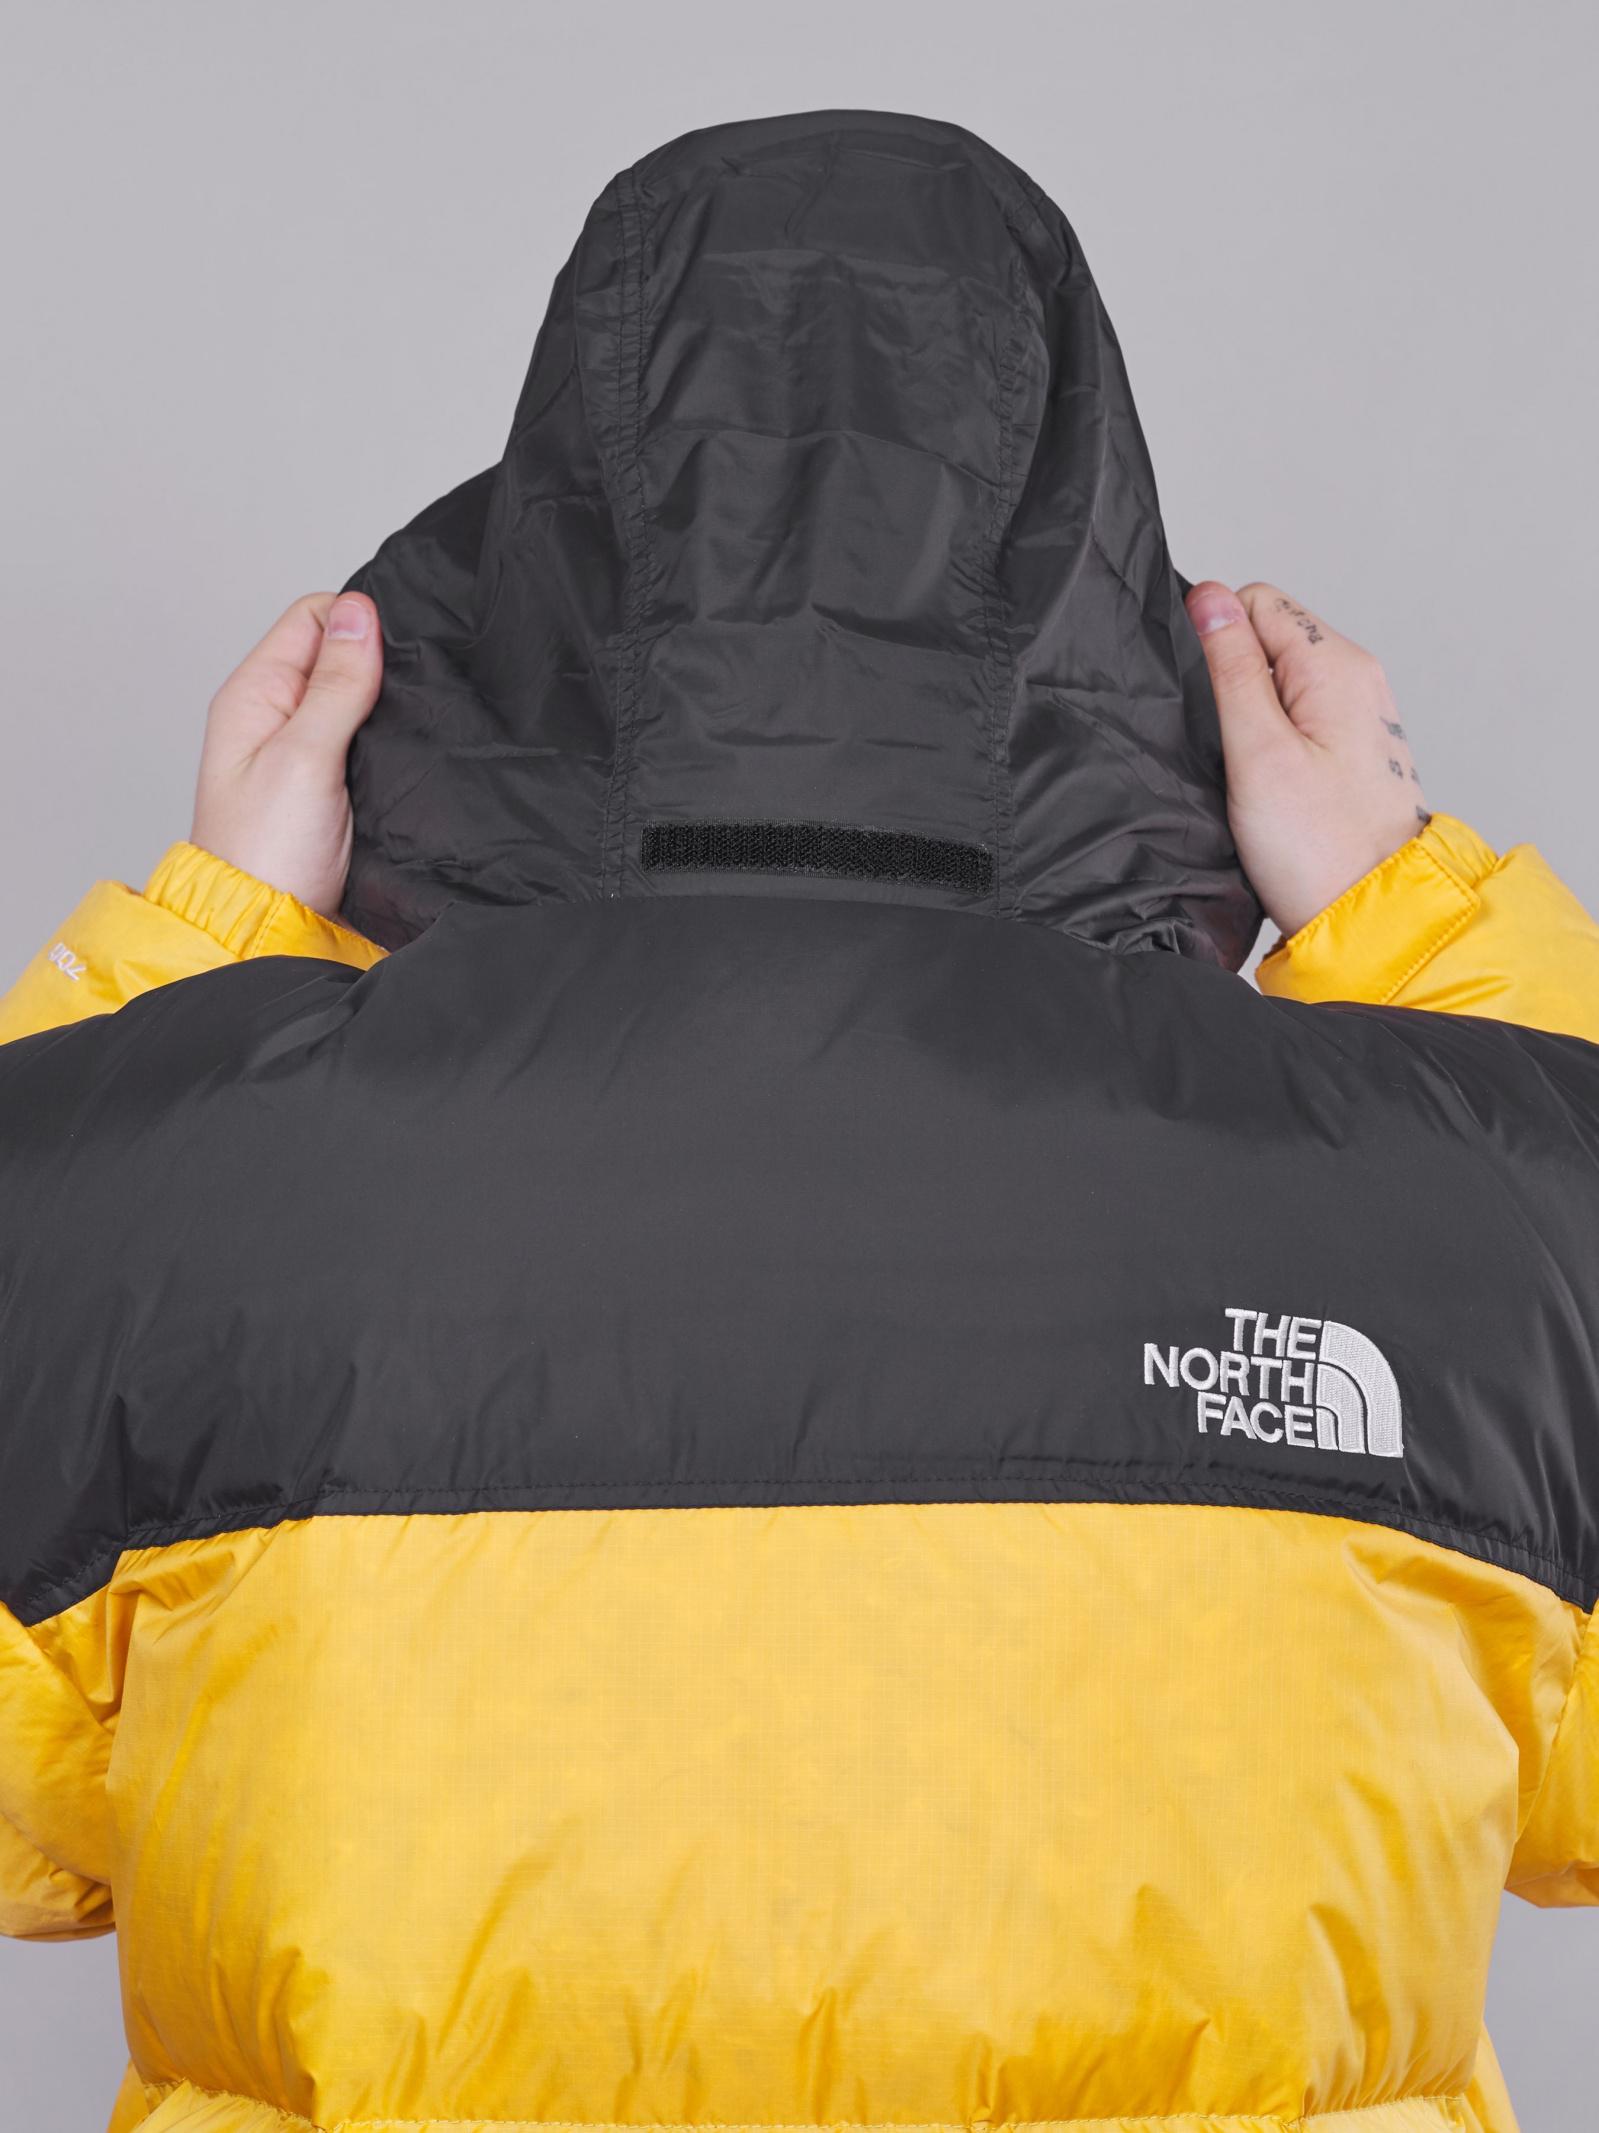 The North Face Куртка чоловічі модель NF0A3C8D70M1 , 2017